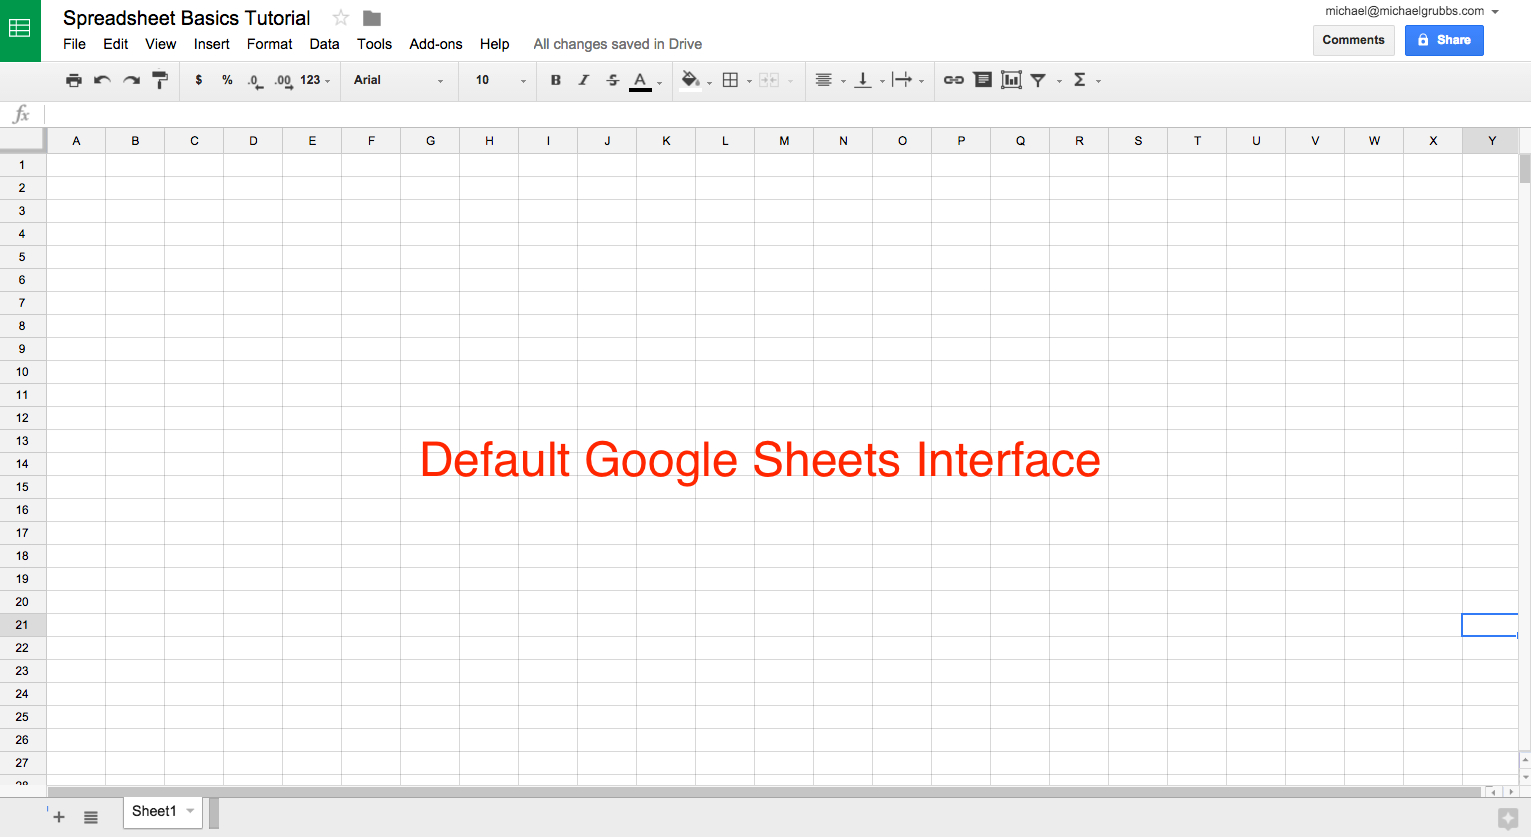 Chrome Spreadsheet Regarding Google Sheets 101: The Beginner's Guide To Online Spreadsheets  The